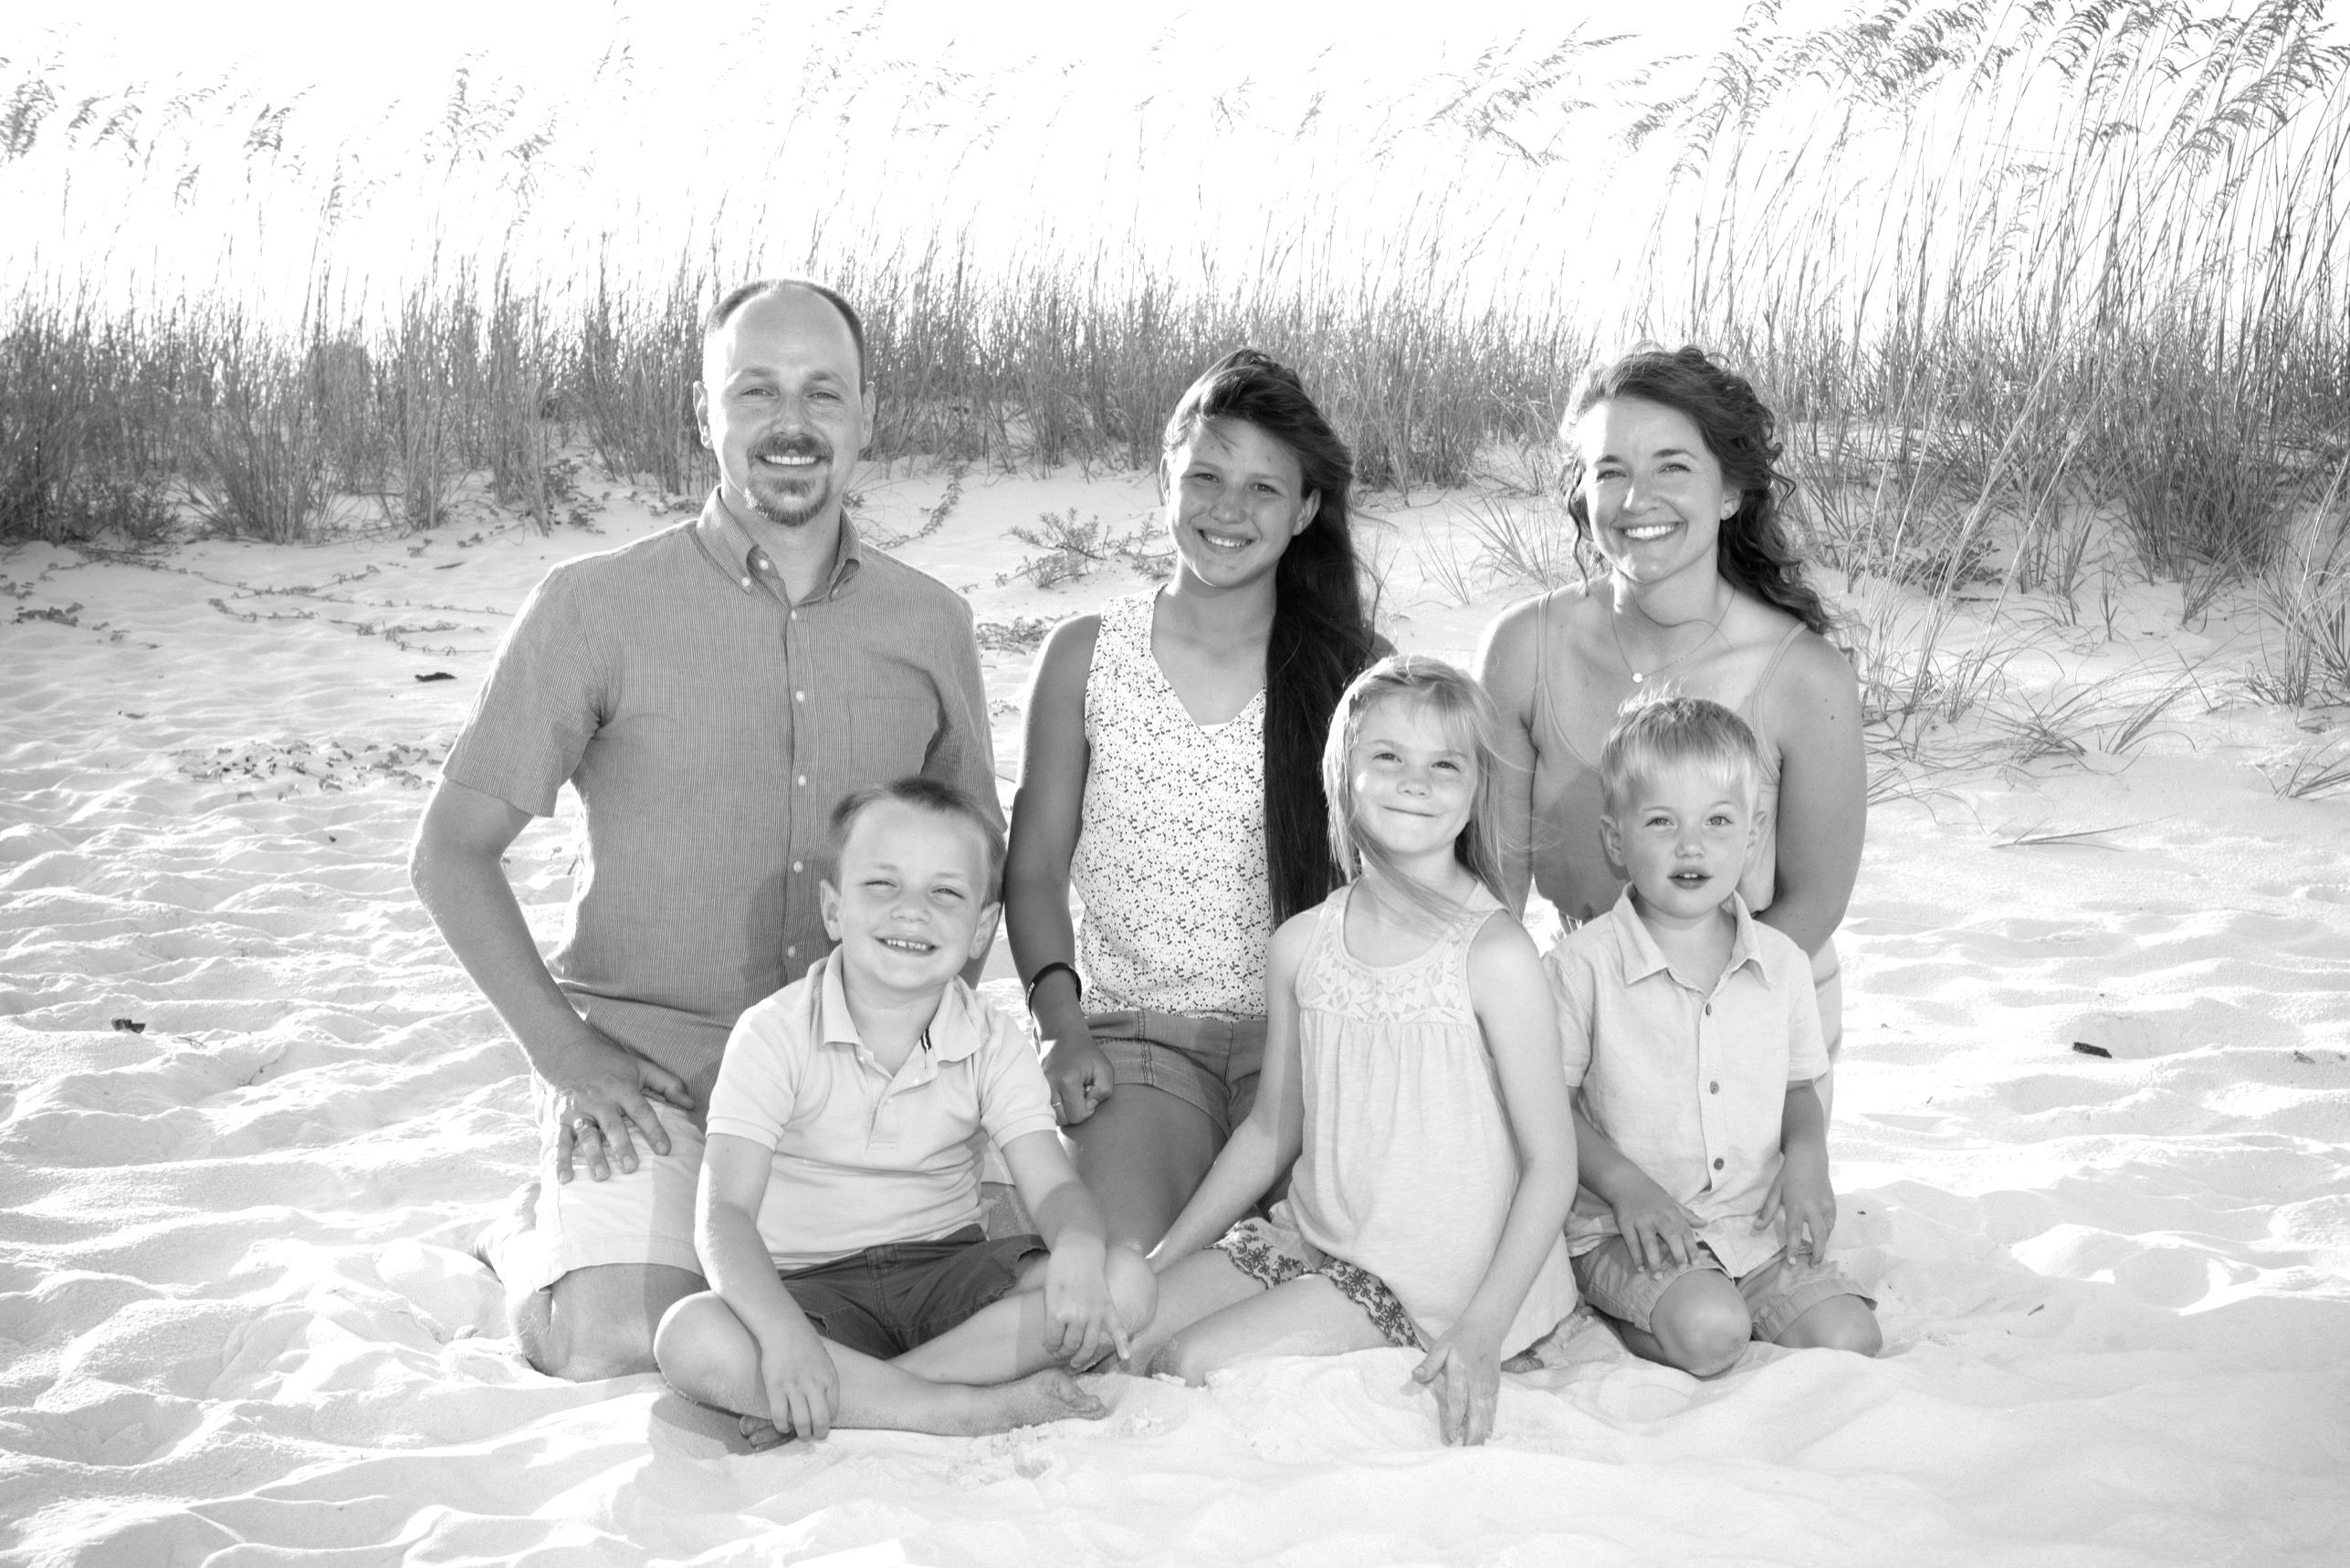 Jenny Townsend's family